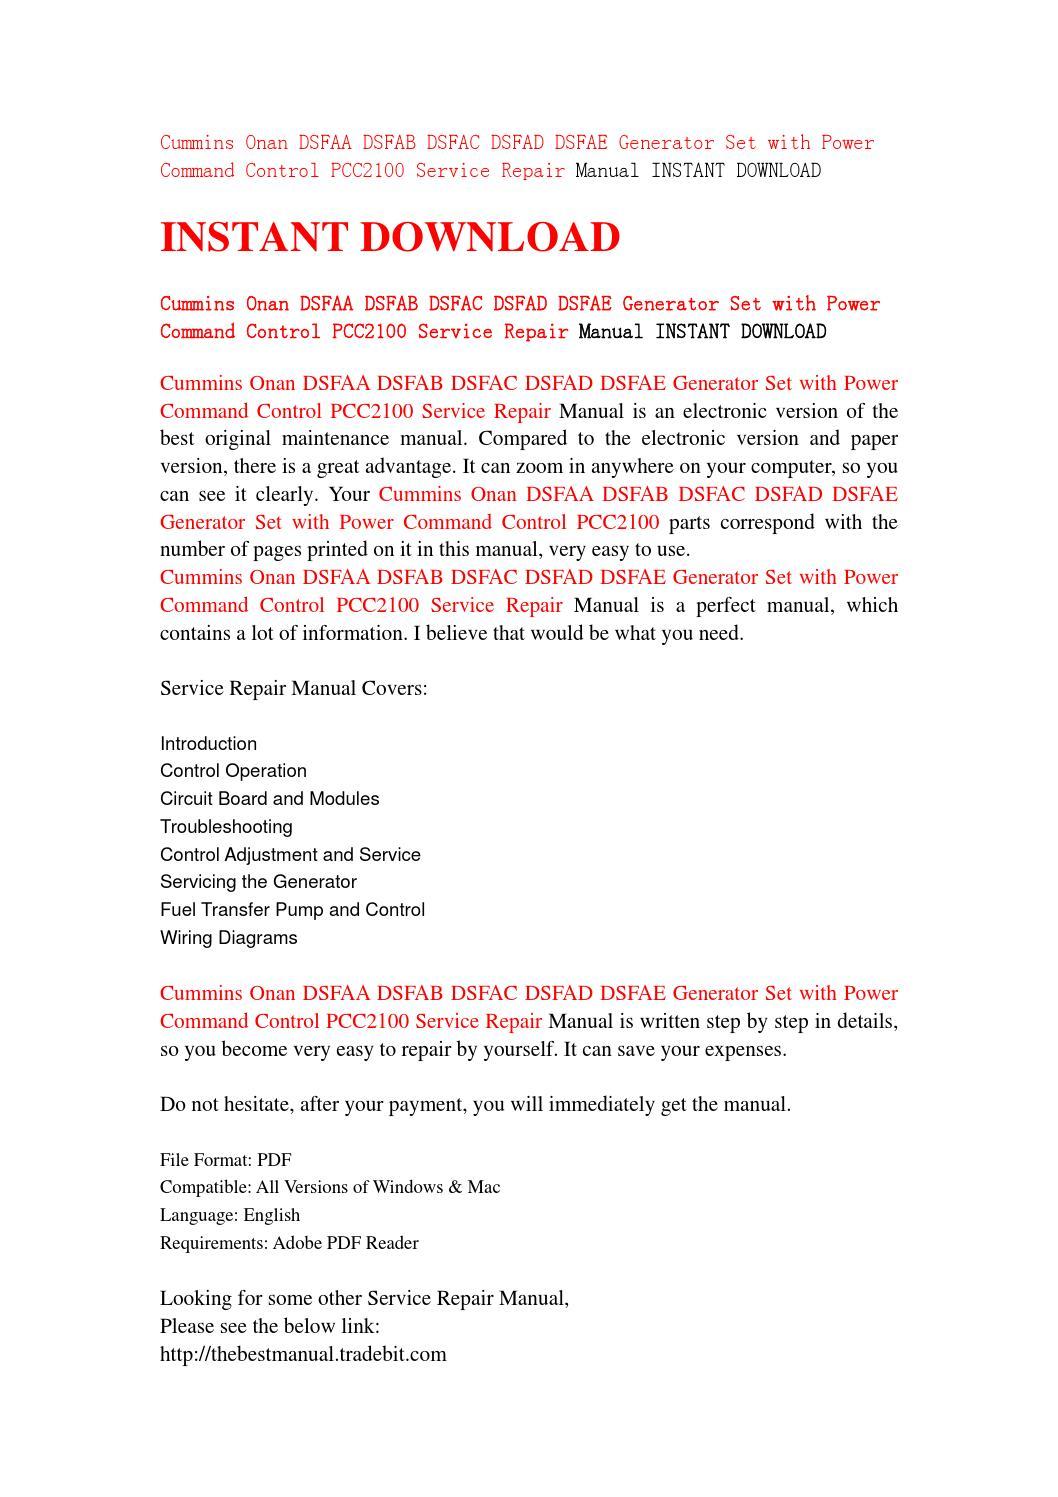 Cummins onan dsfaa dsfab dsfac dsfad dsfae generator set with power command  control pcc2100 service by servicemanual201587 - issuu